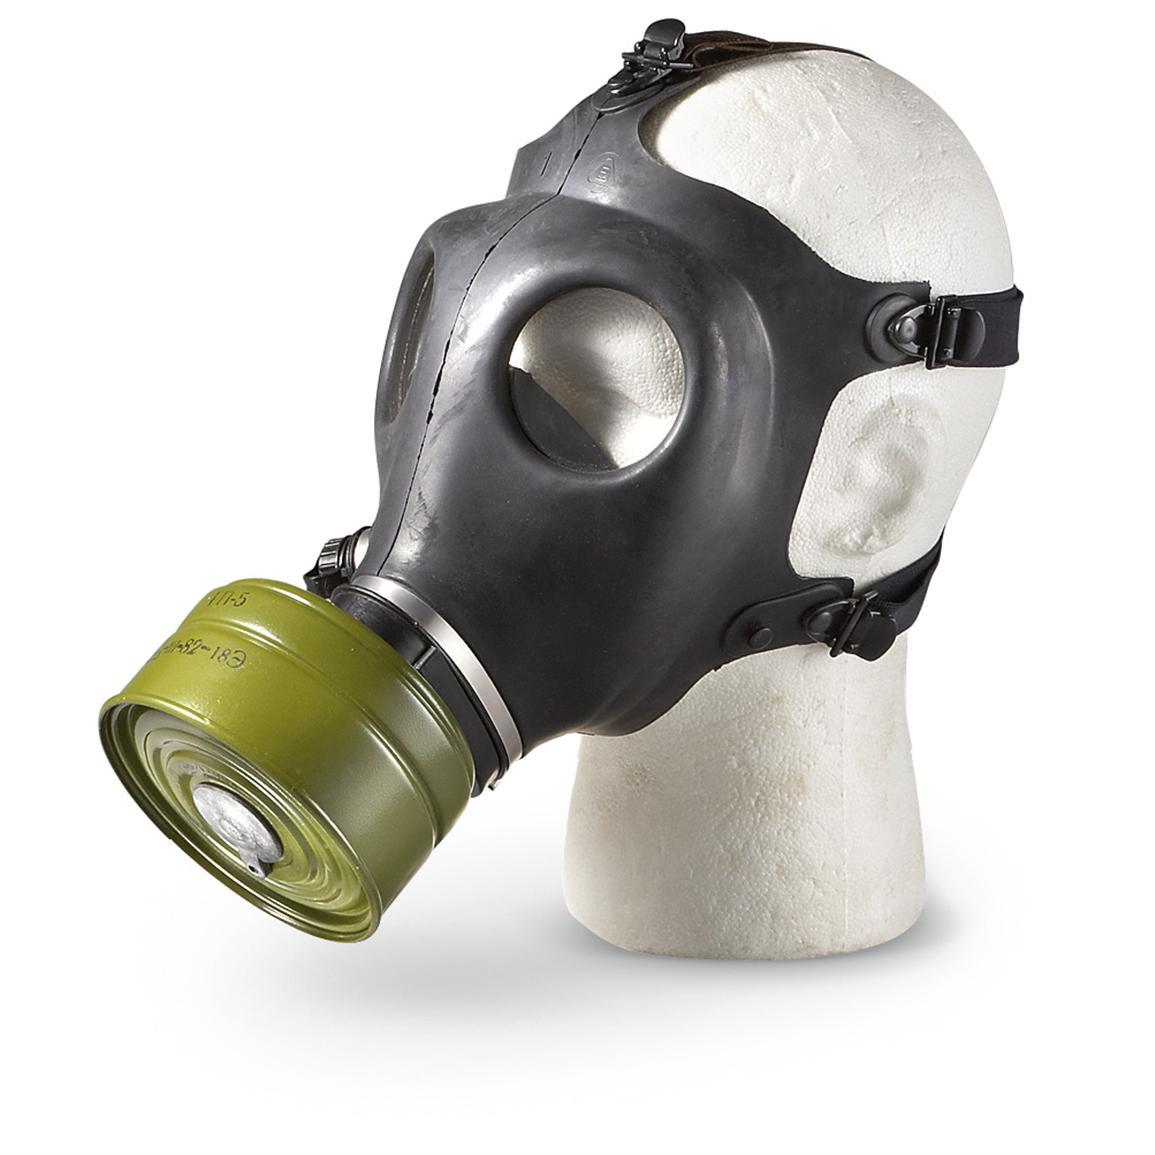 Gas Mask HD wallpapers, Desktop wallpaper - most viewed